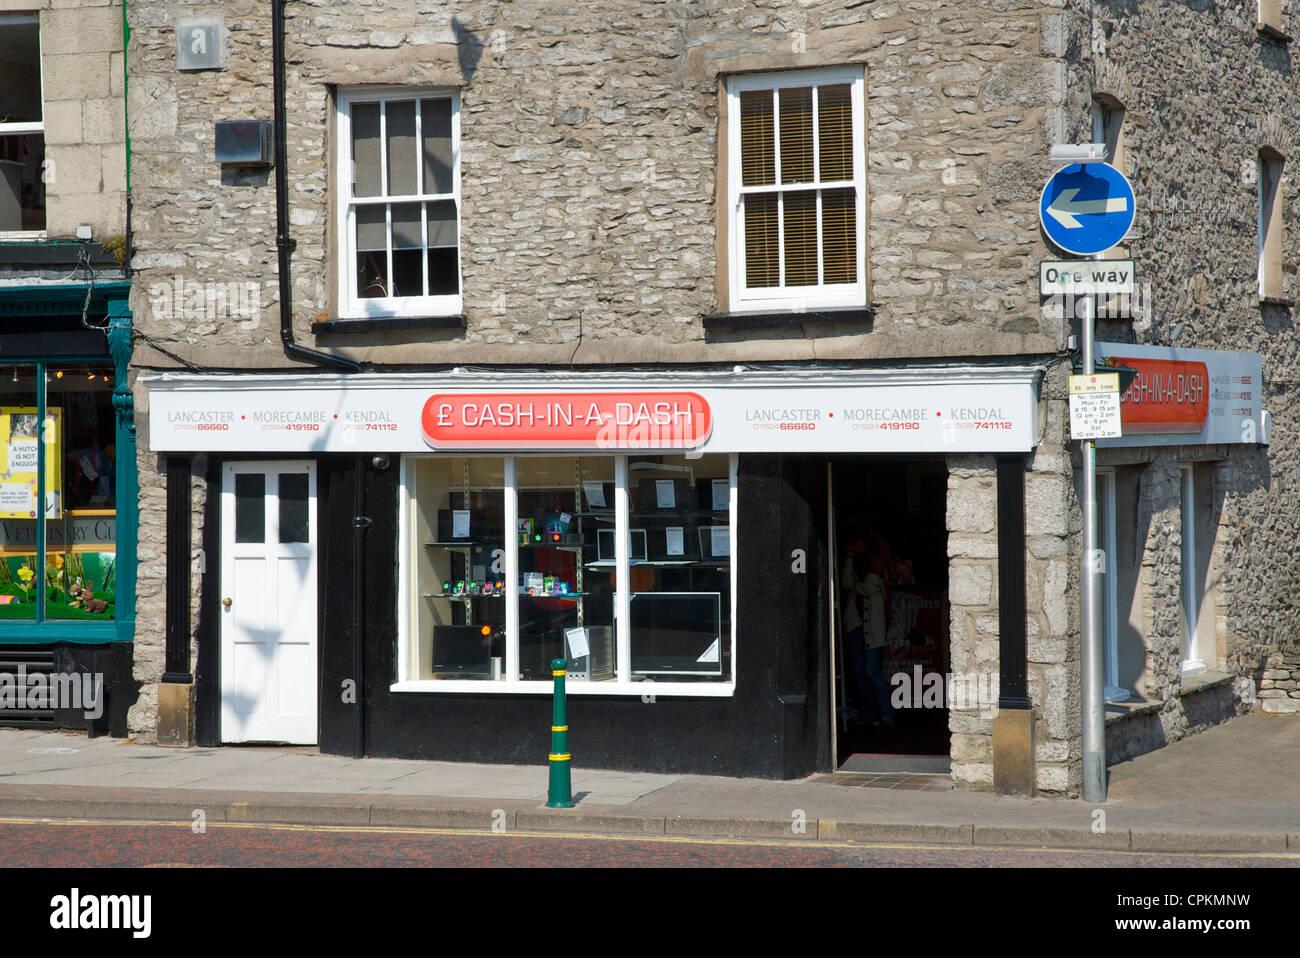 Cash in a Dash shop on Highgate, Kendal, Cumbria, England UK - Stock Image